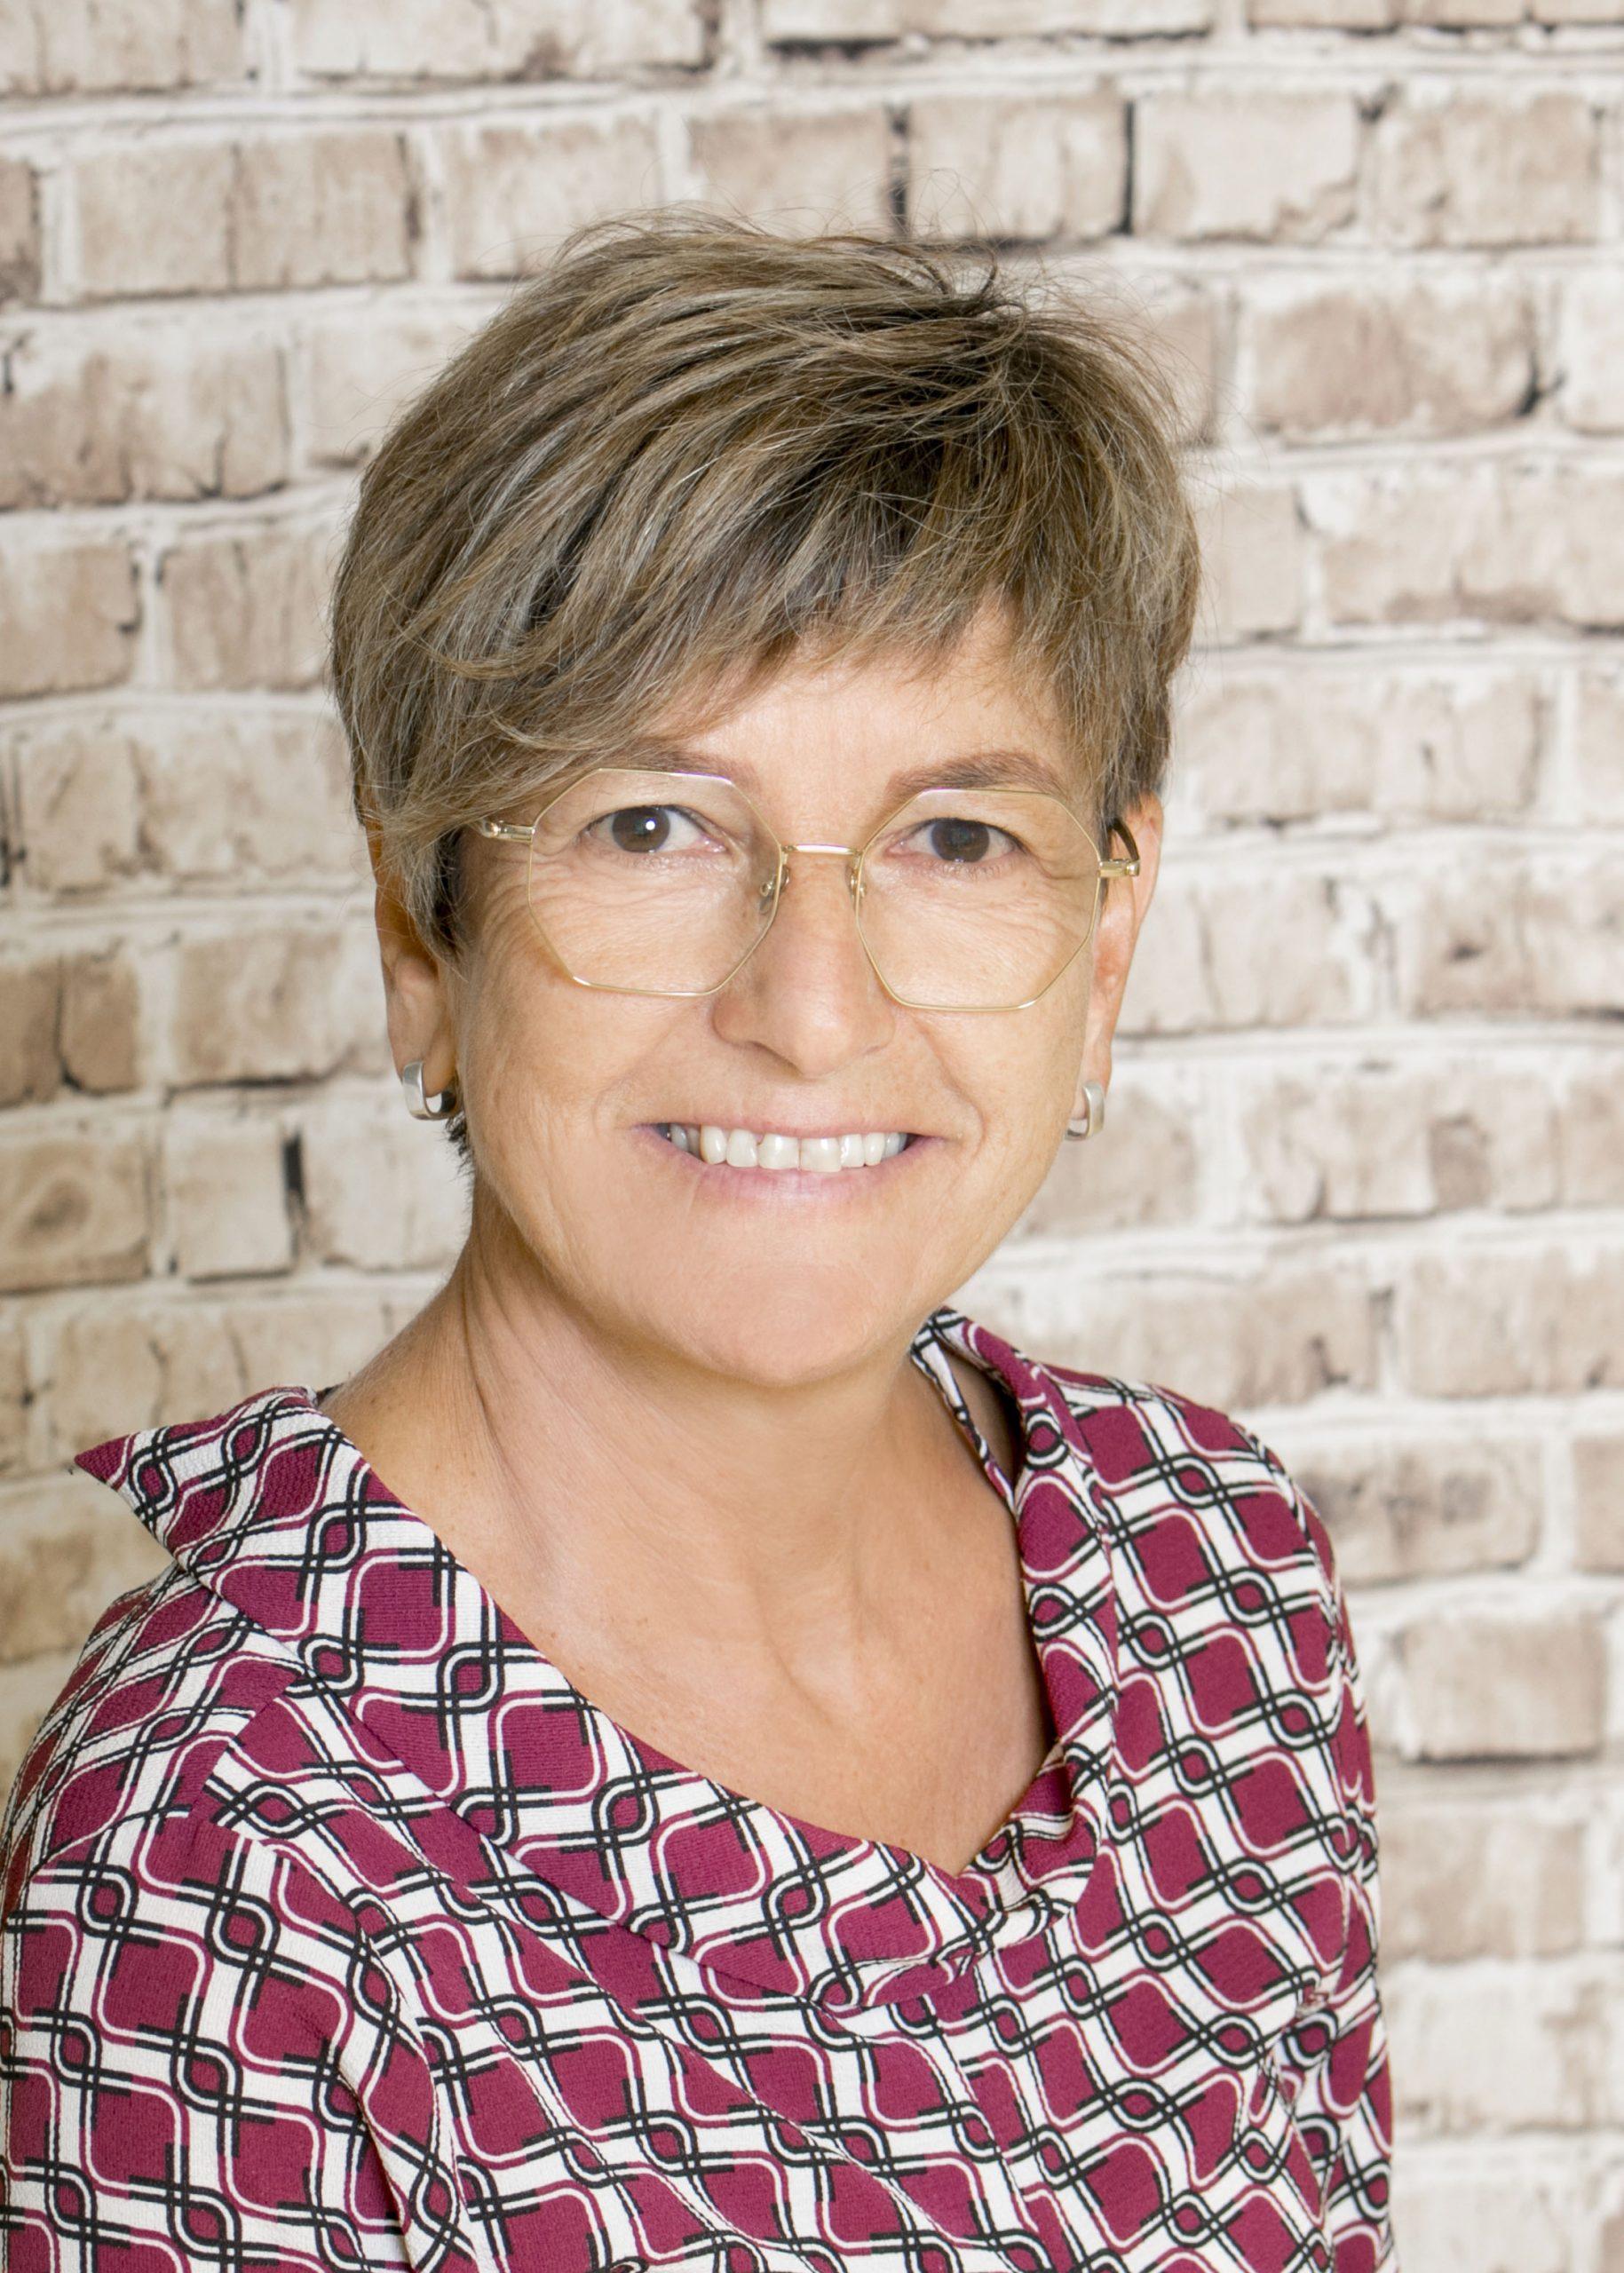 Sonja Bartl